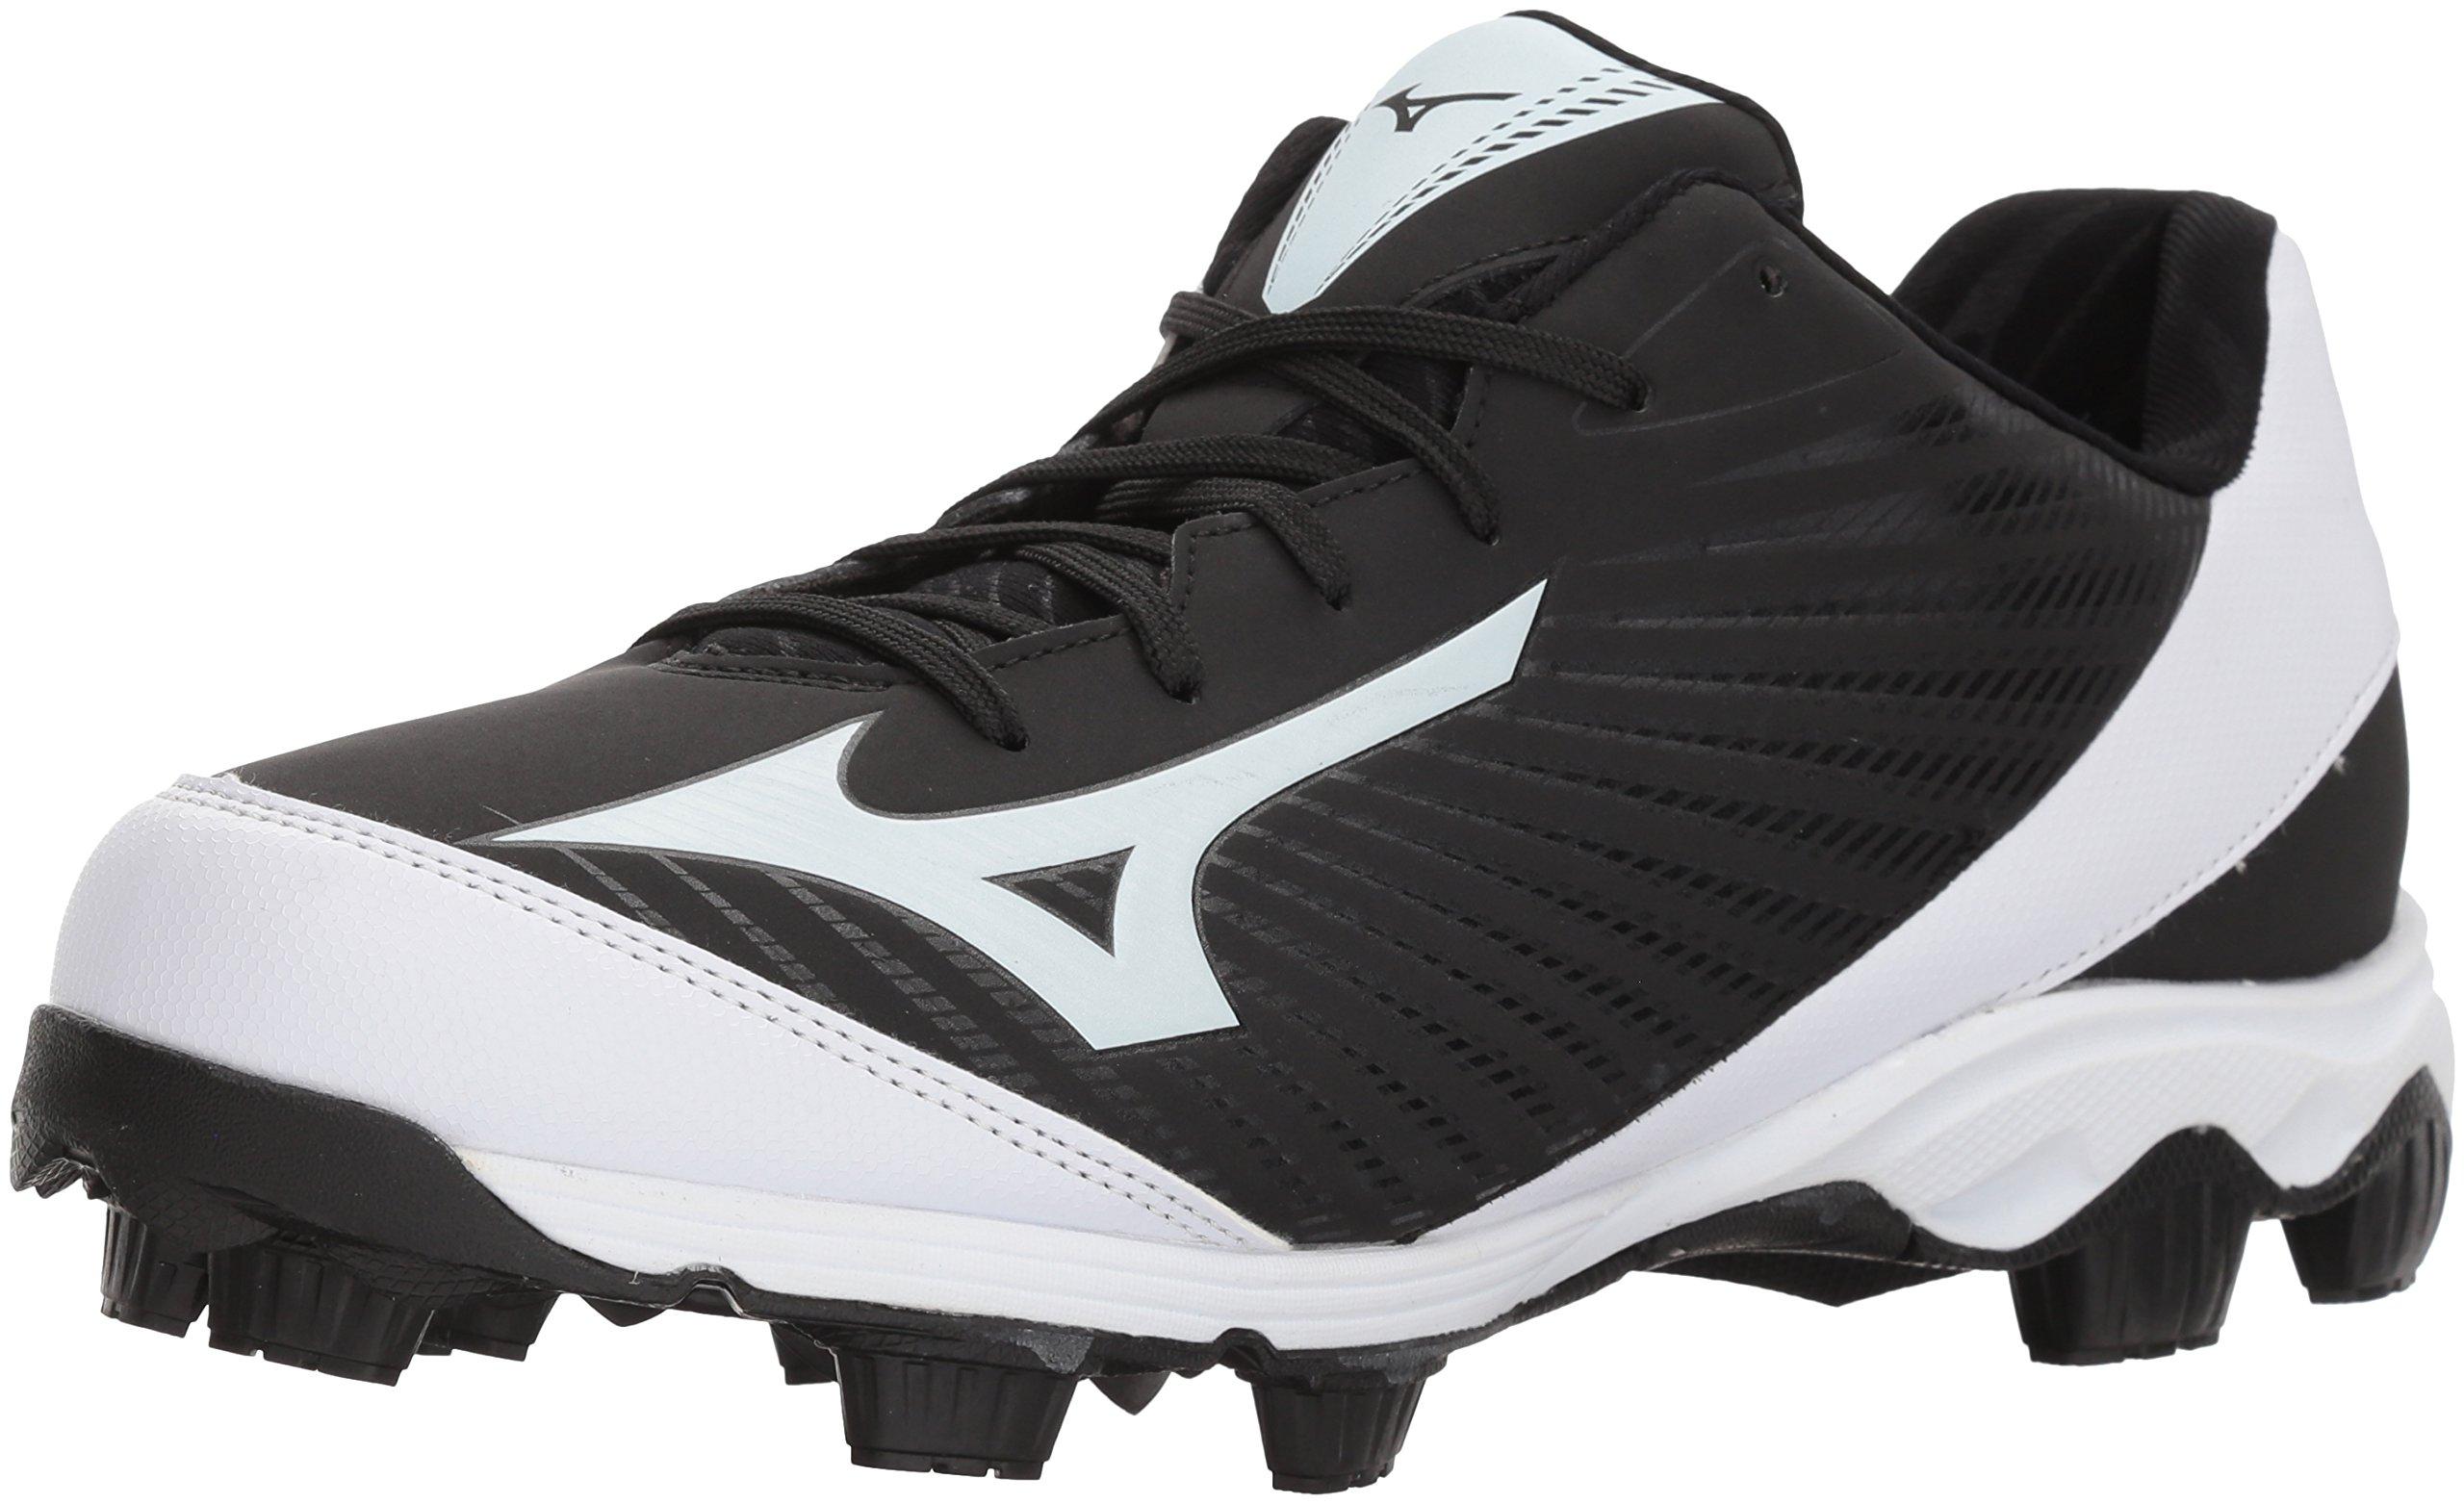 Mizuno (MIZD9) Men's 9-Spike Advanced Franchise 9 Molded Cleat-Low Baseball Shoe, Black/White, 12 D US